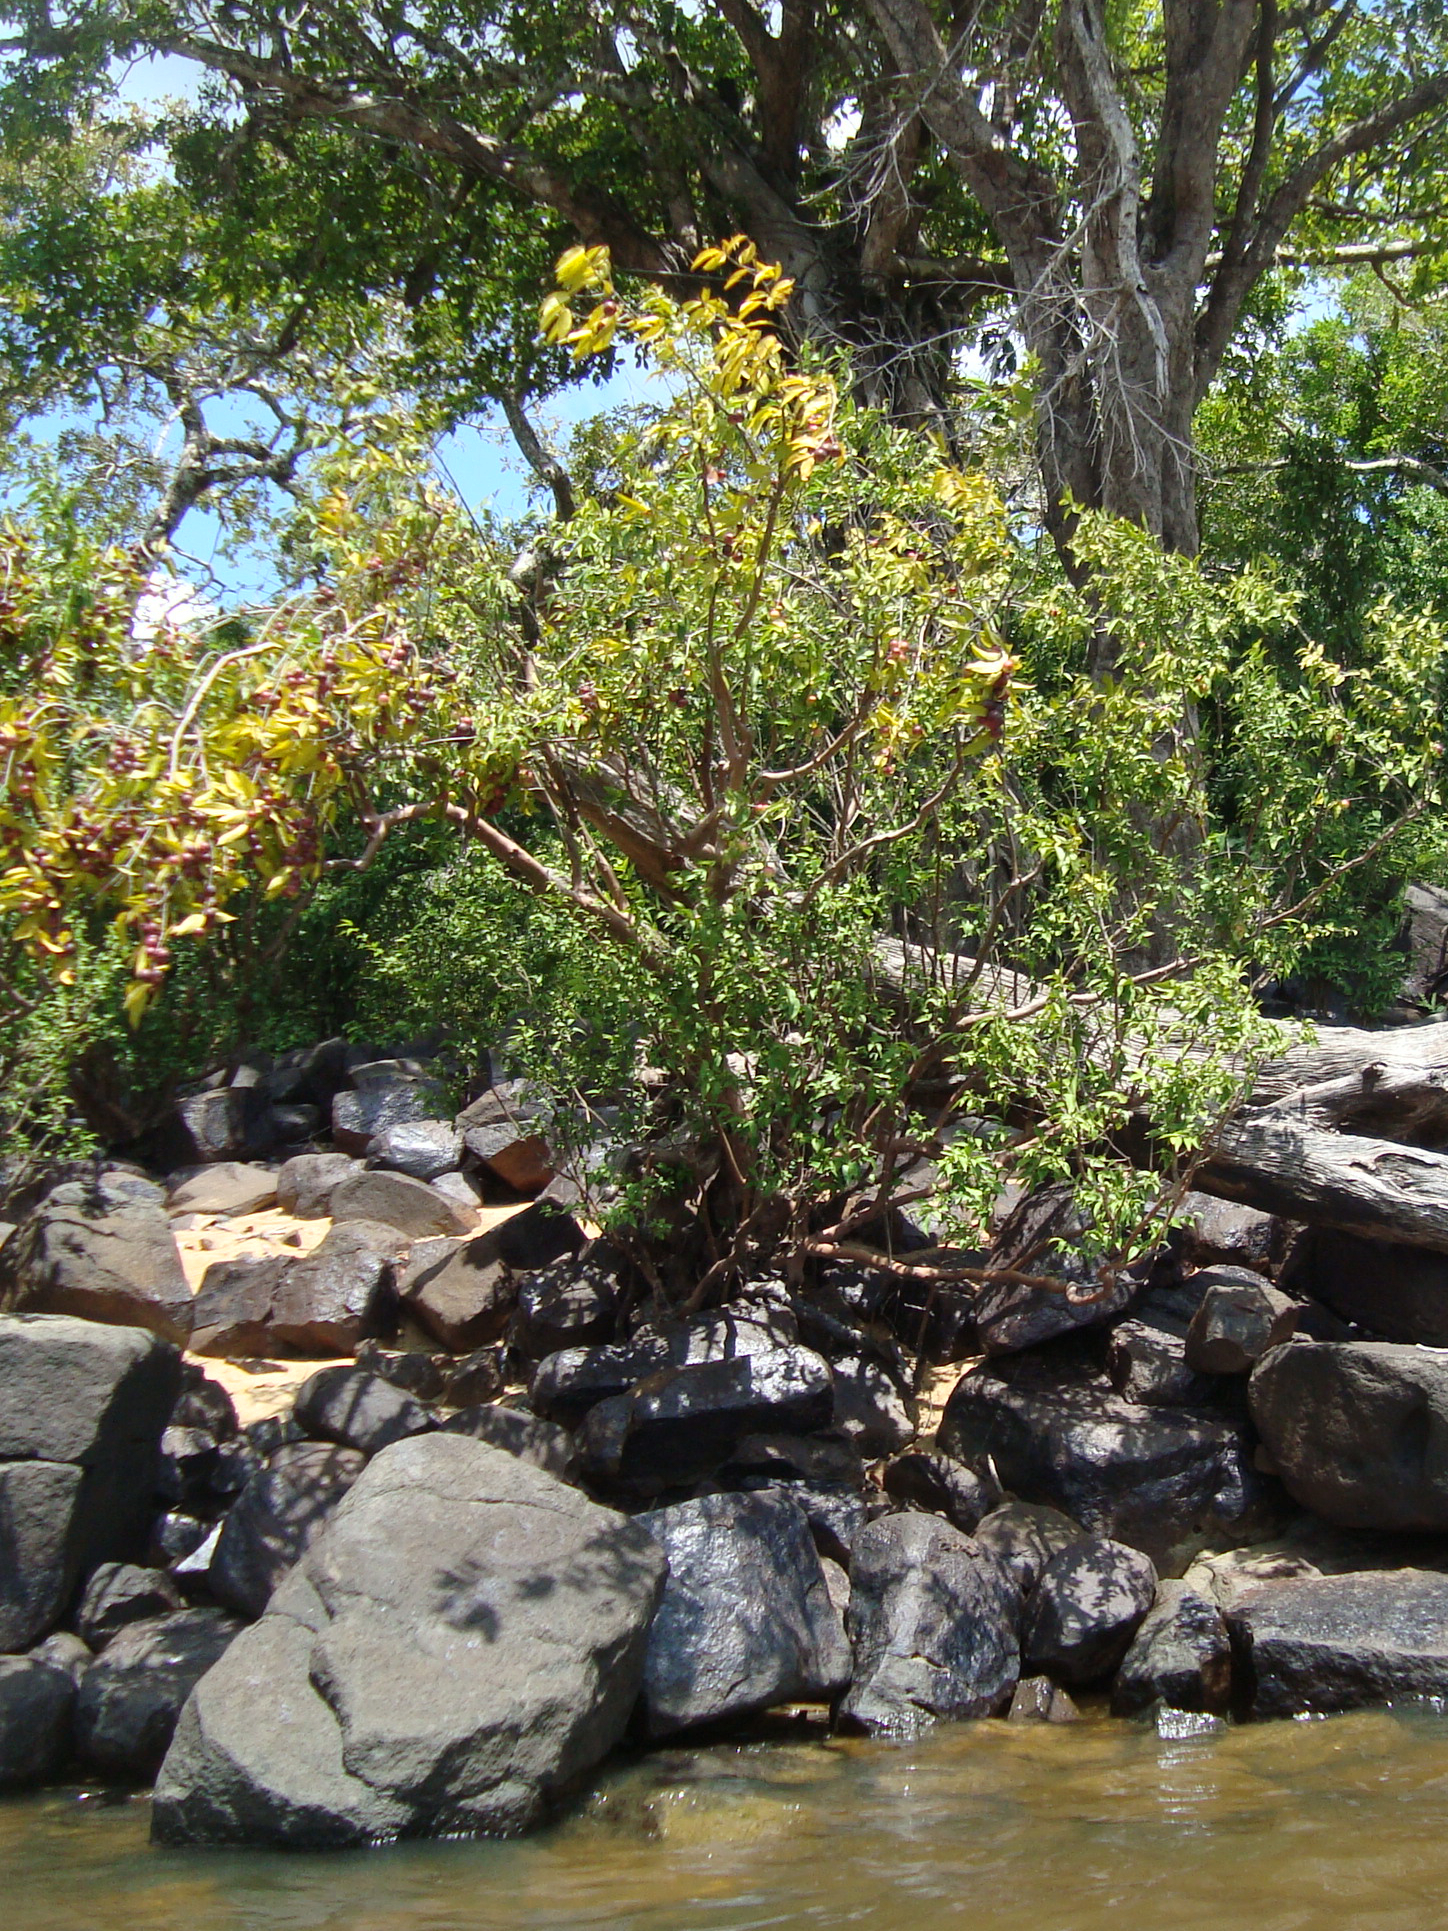 Myrciaria dubia - Wikipedia